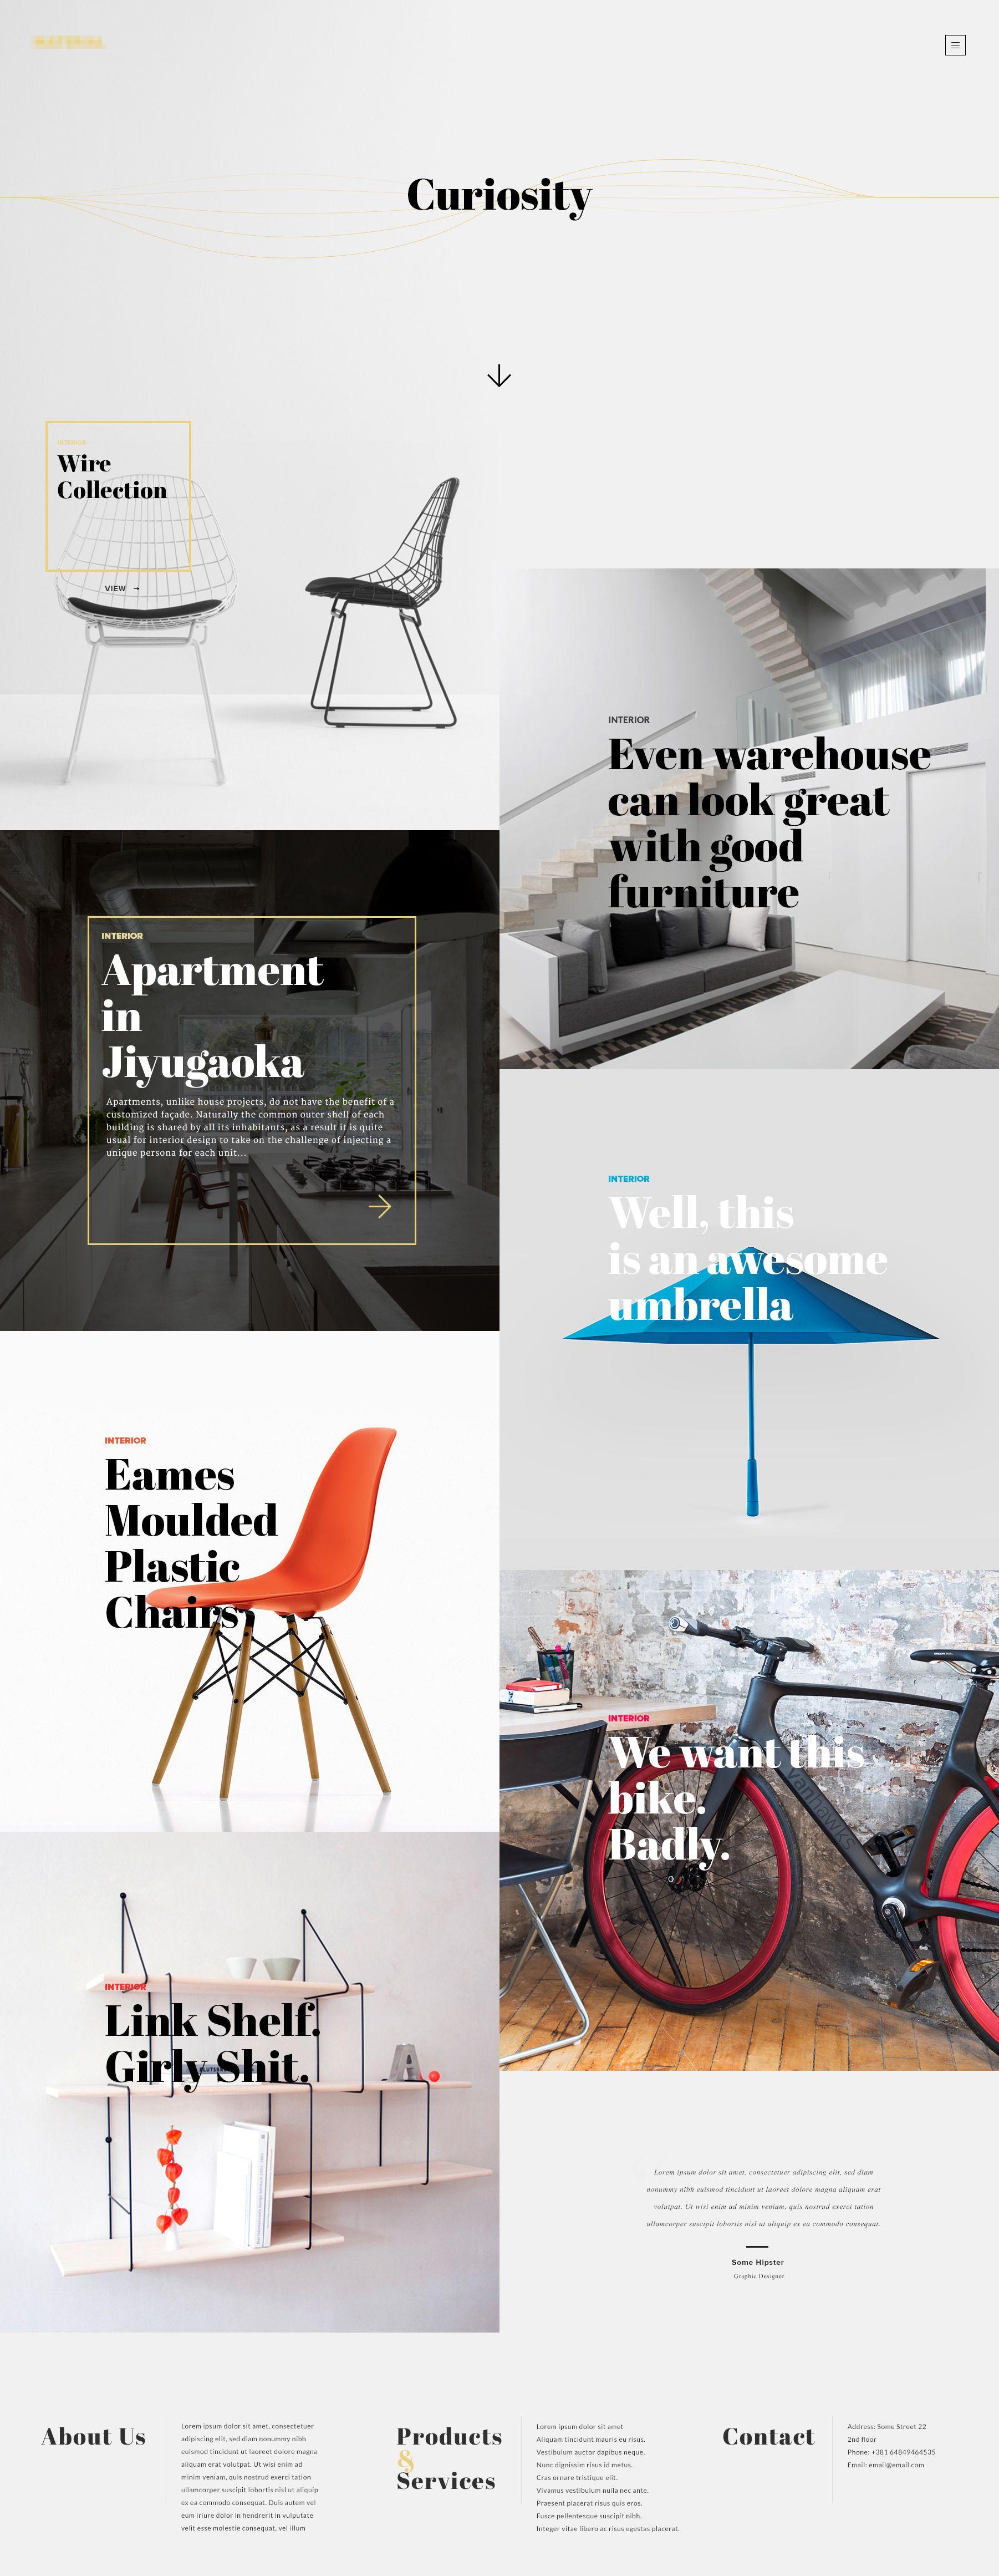 Pin De Valerie Rausch En Site Design Pinterest Portafolio  # Muebles Pagina Web